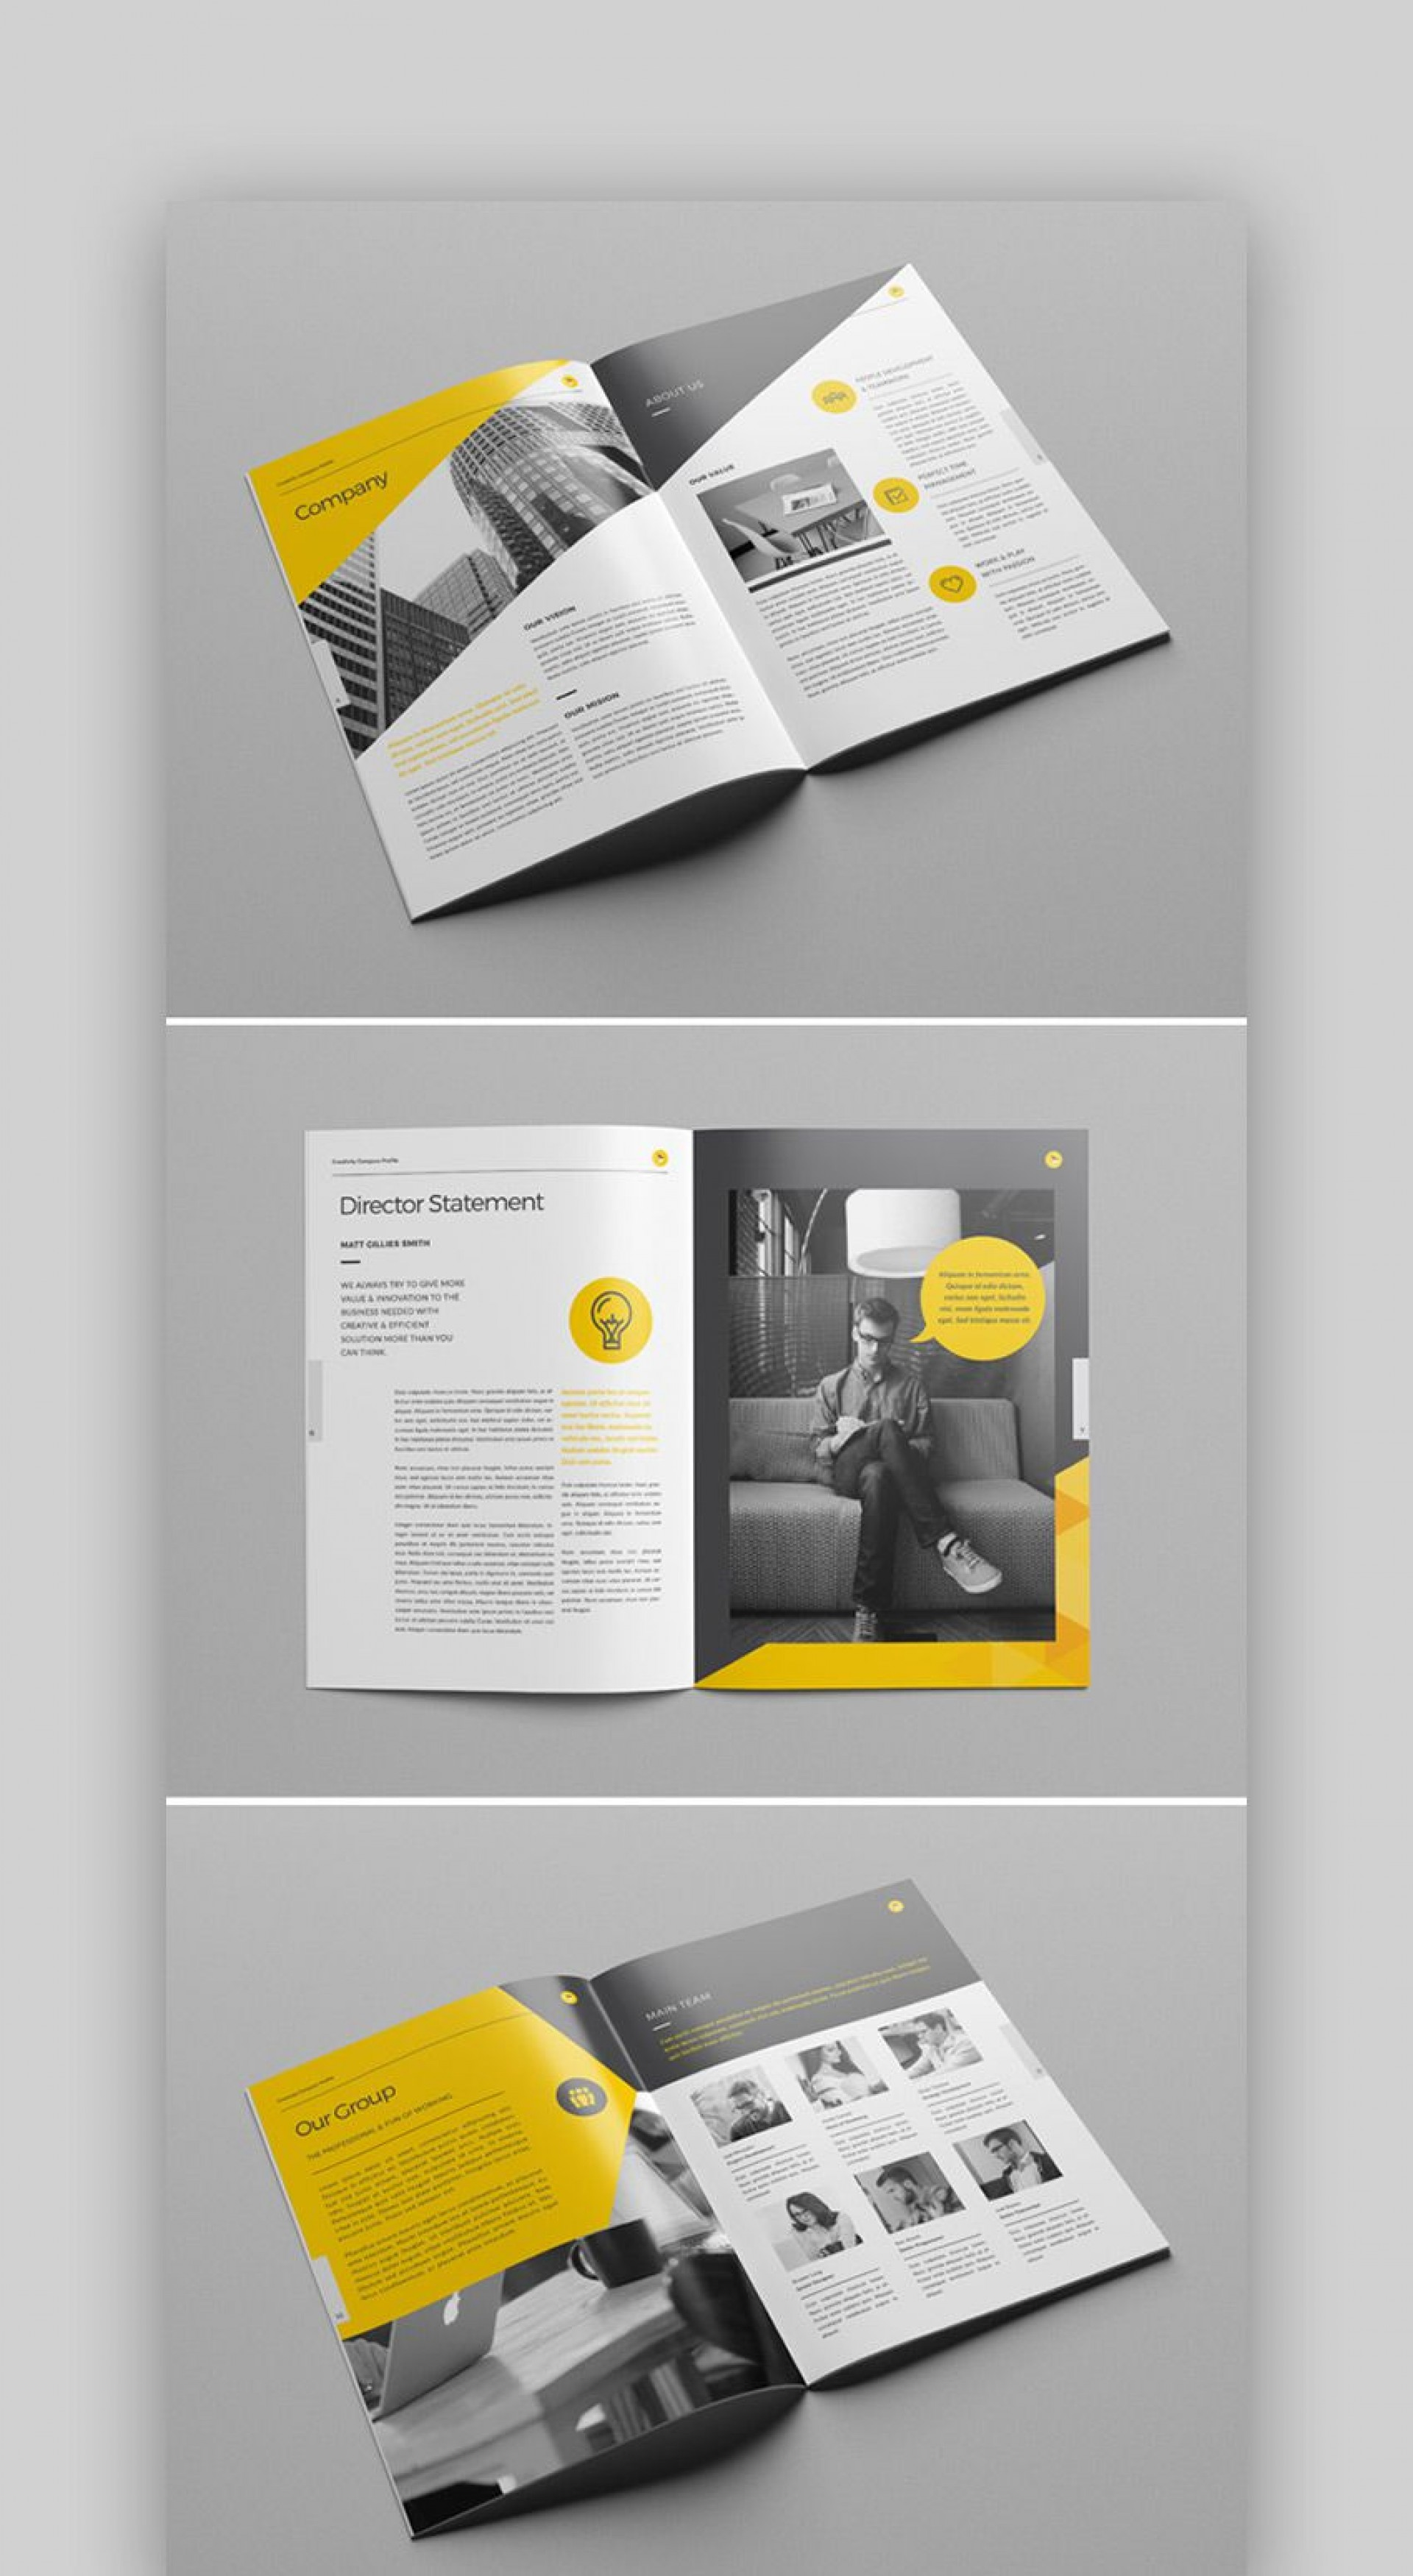 009 Imposing Adobe Indesign Brochure Template Free Download Design 1920